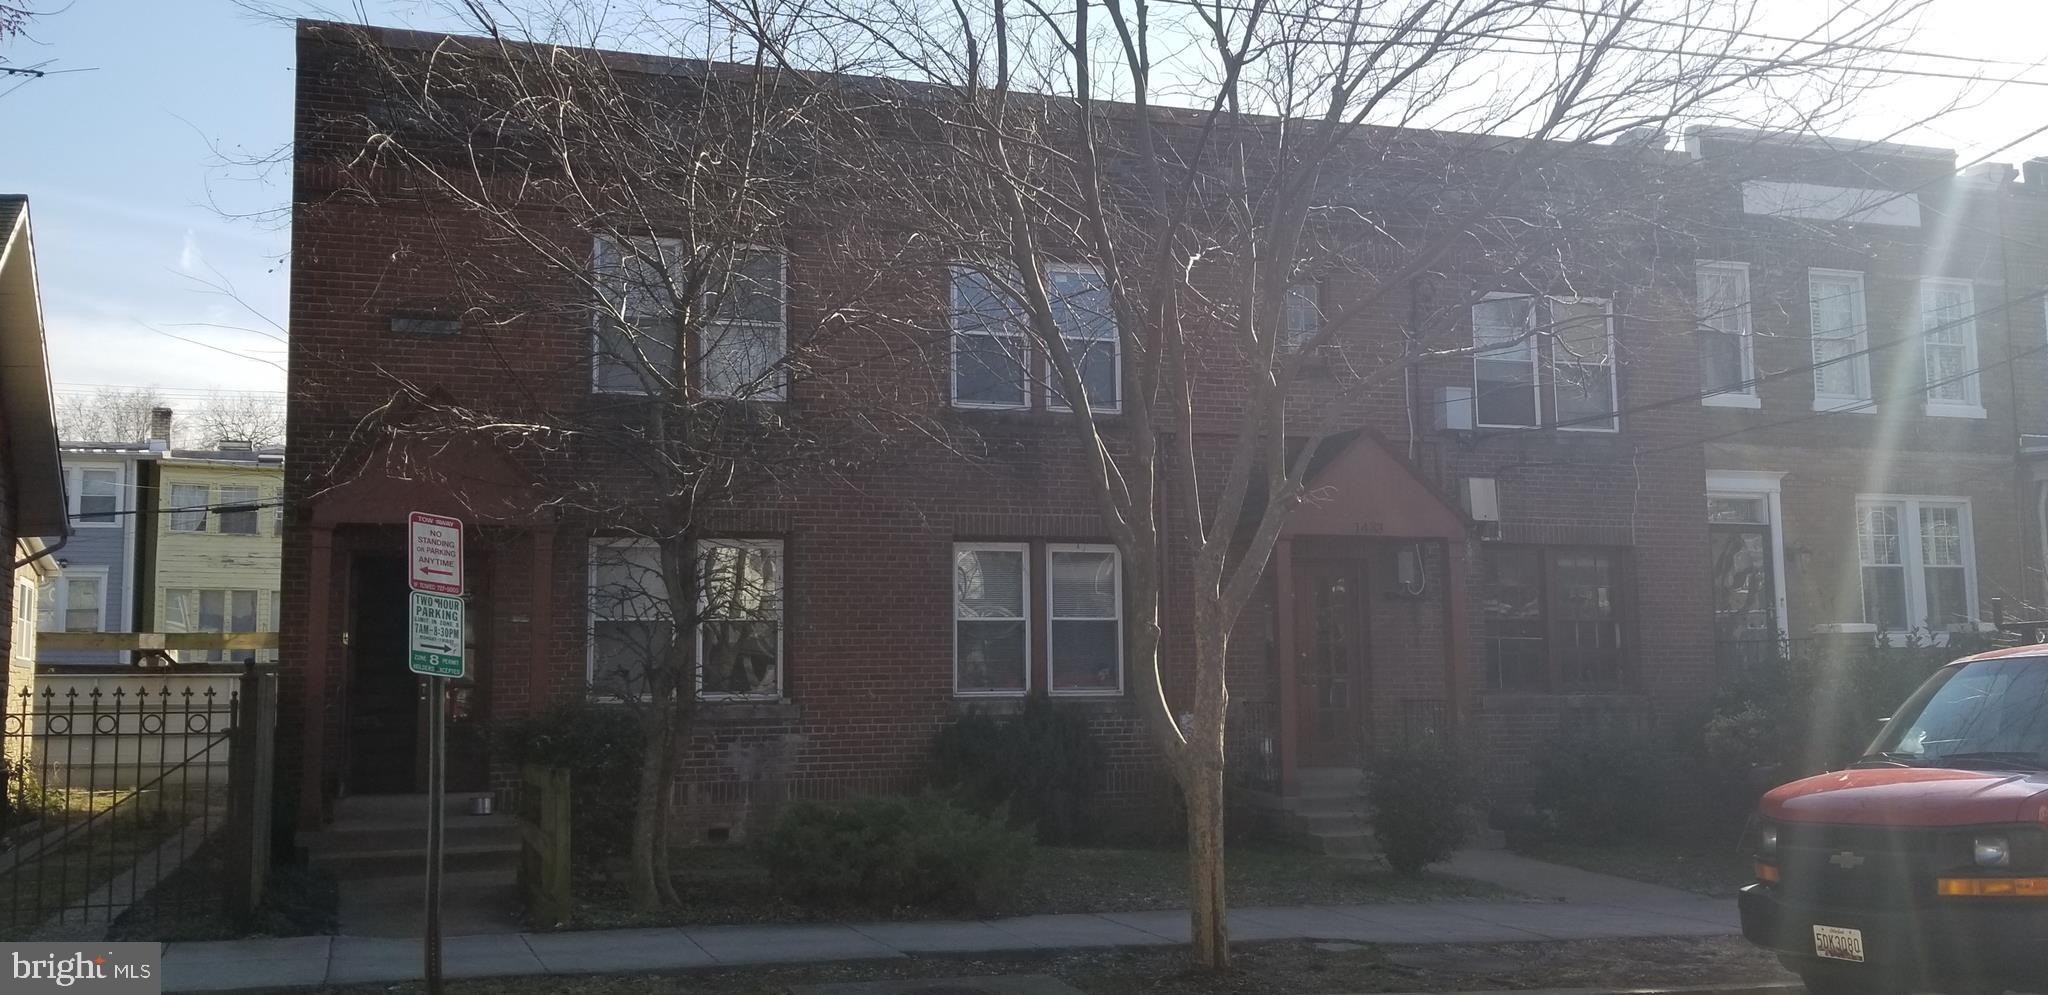 1433 S STREET SE, WASHINGTON, DC 20020